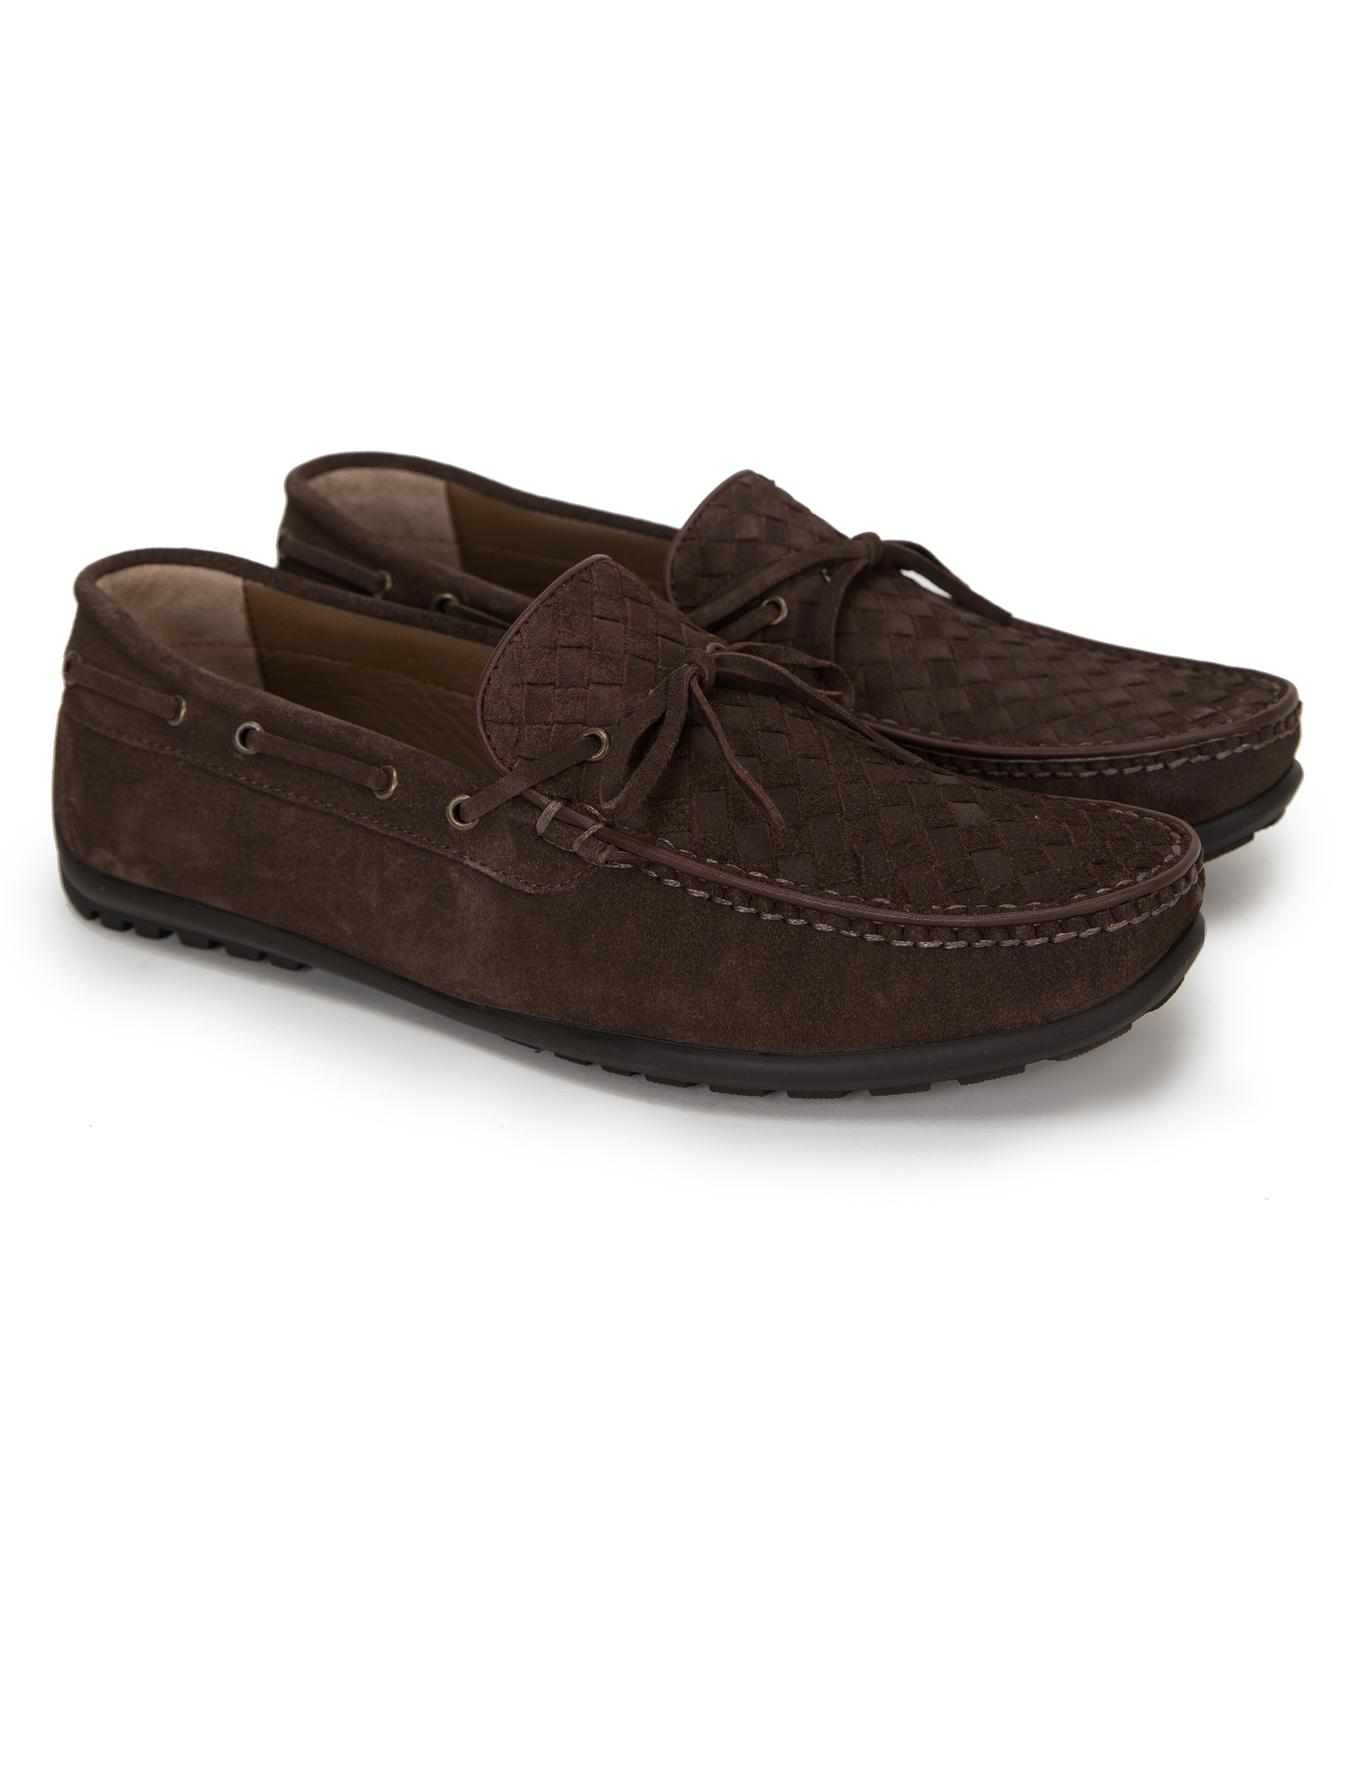 Kahverengi Ayakkabı - 50235875017